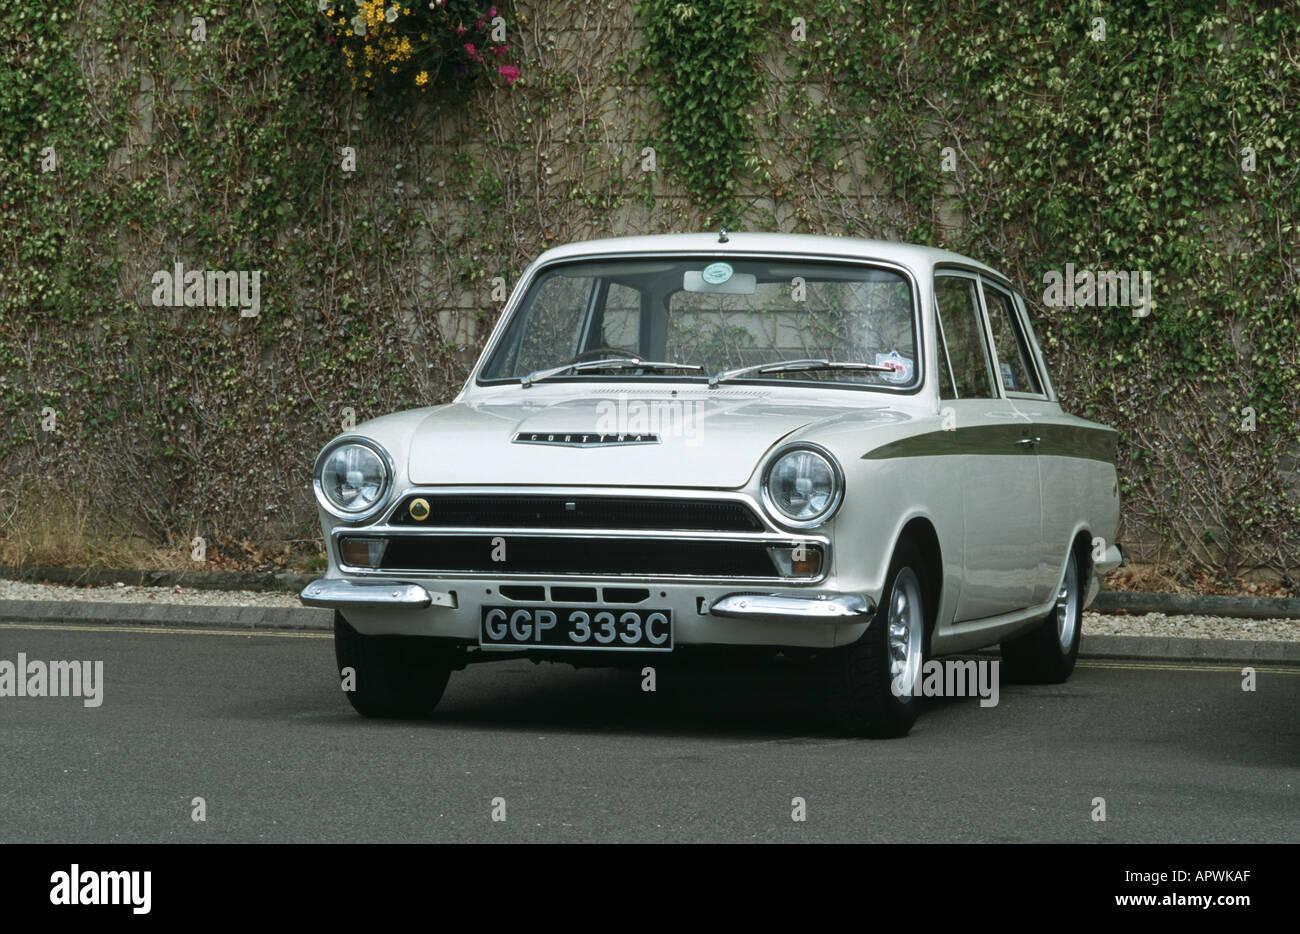 Ford/Lotus Cortina MK1 of 1965. Built 1963 to 1966 Stock Photo